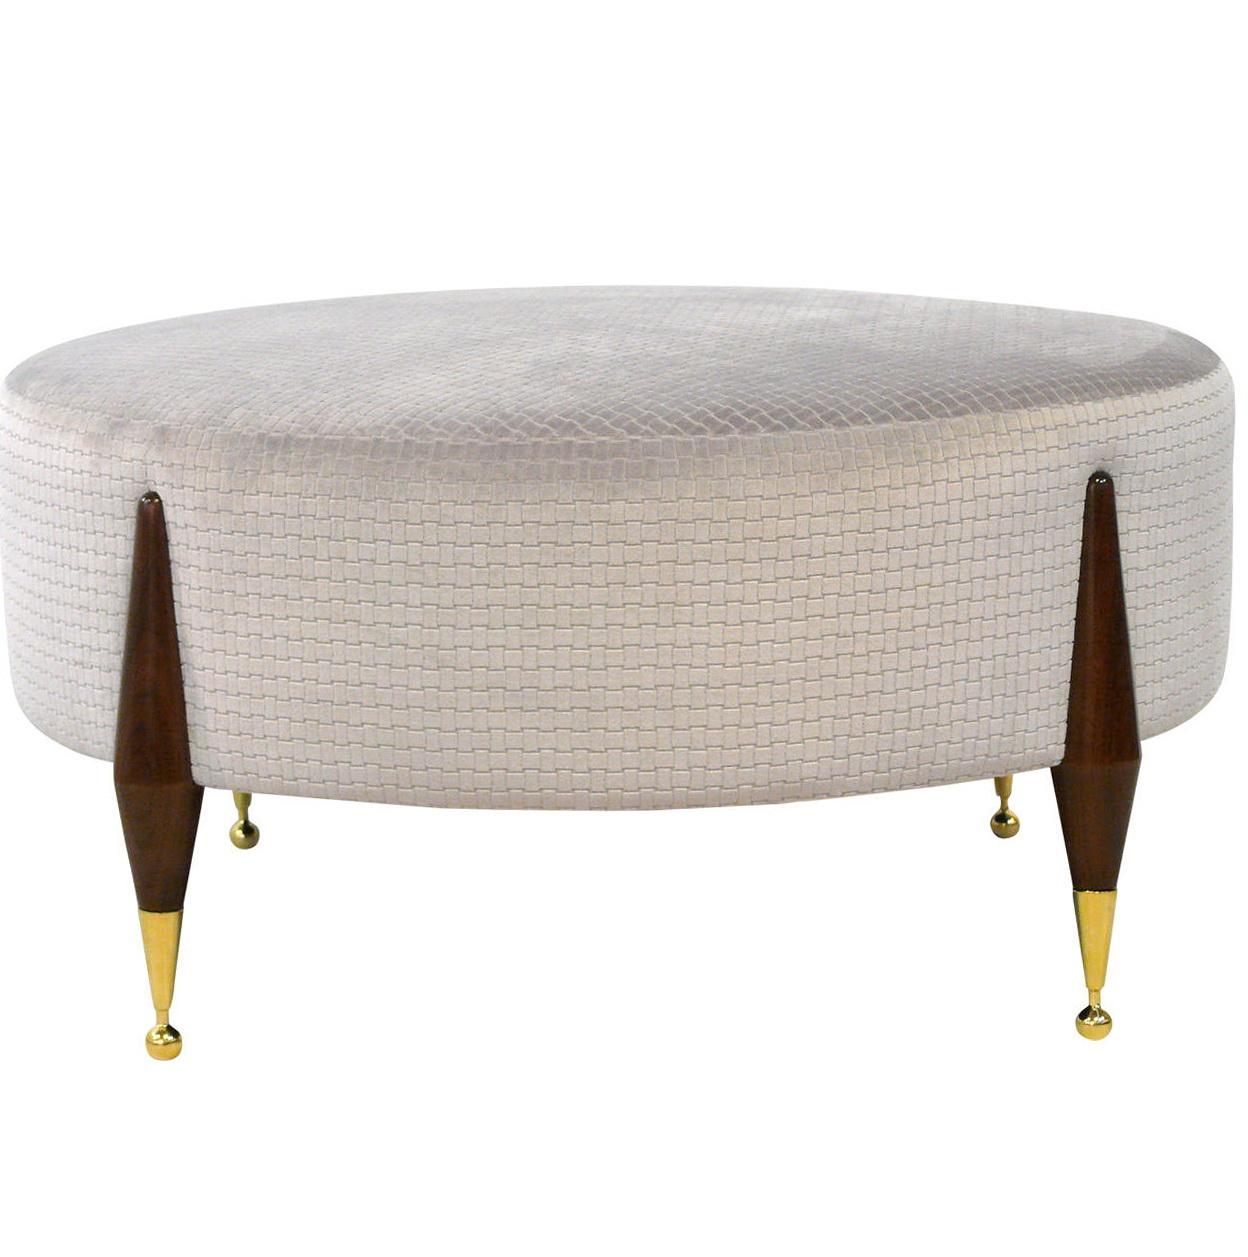 Coffee Table Foot Cushion